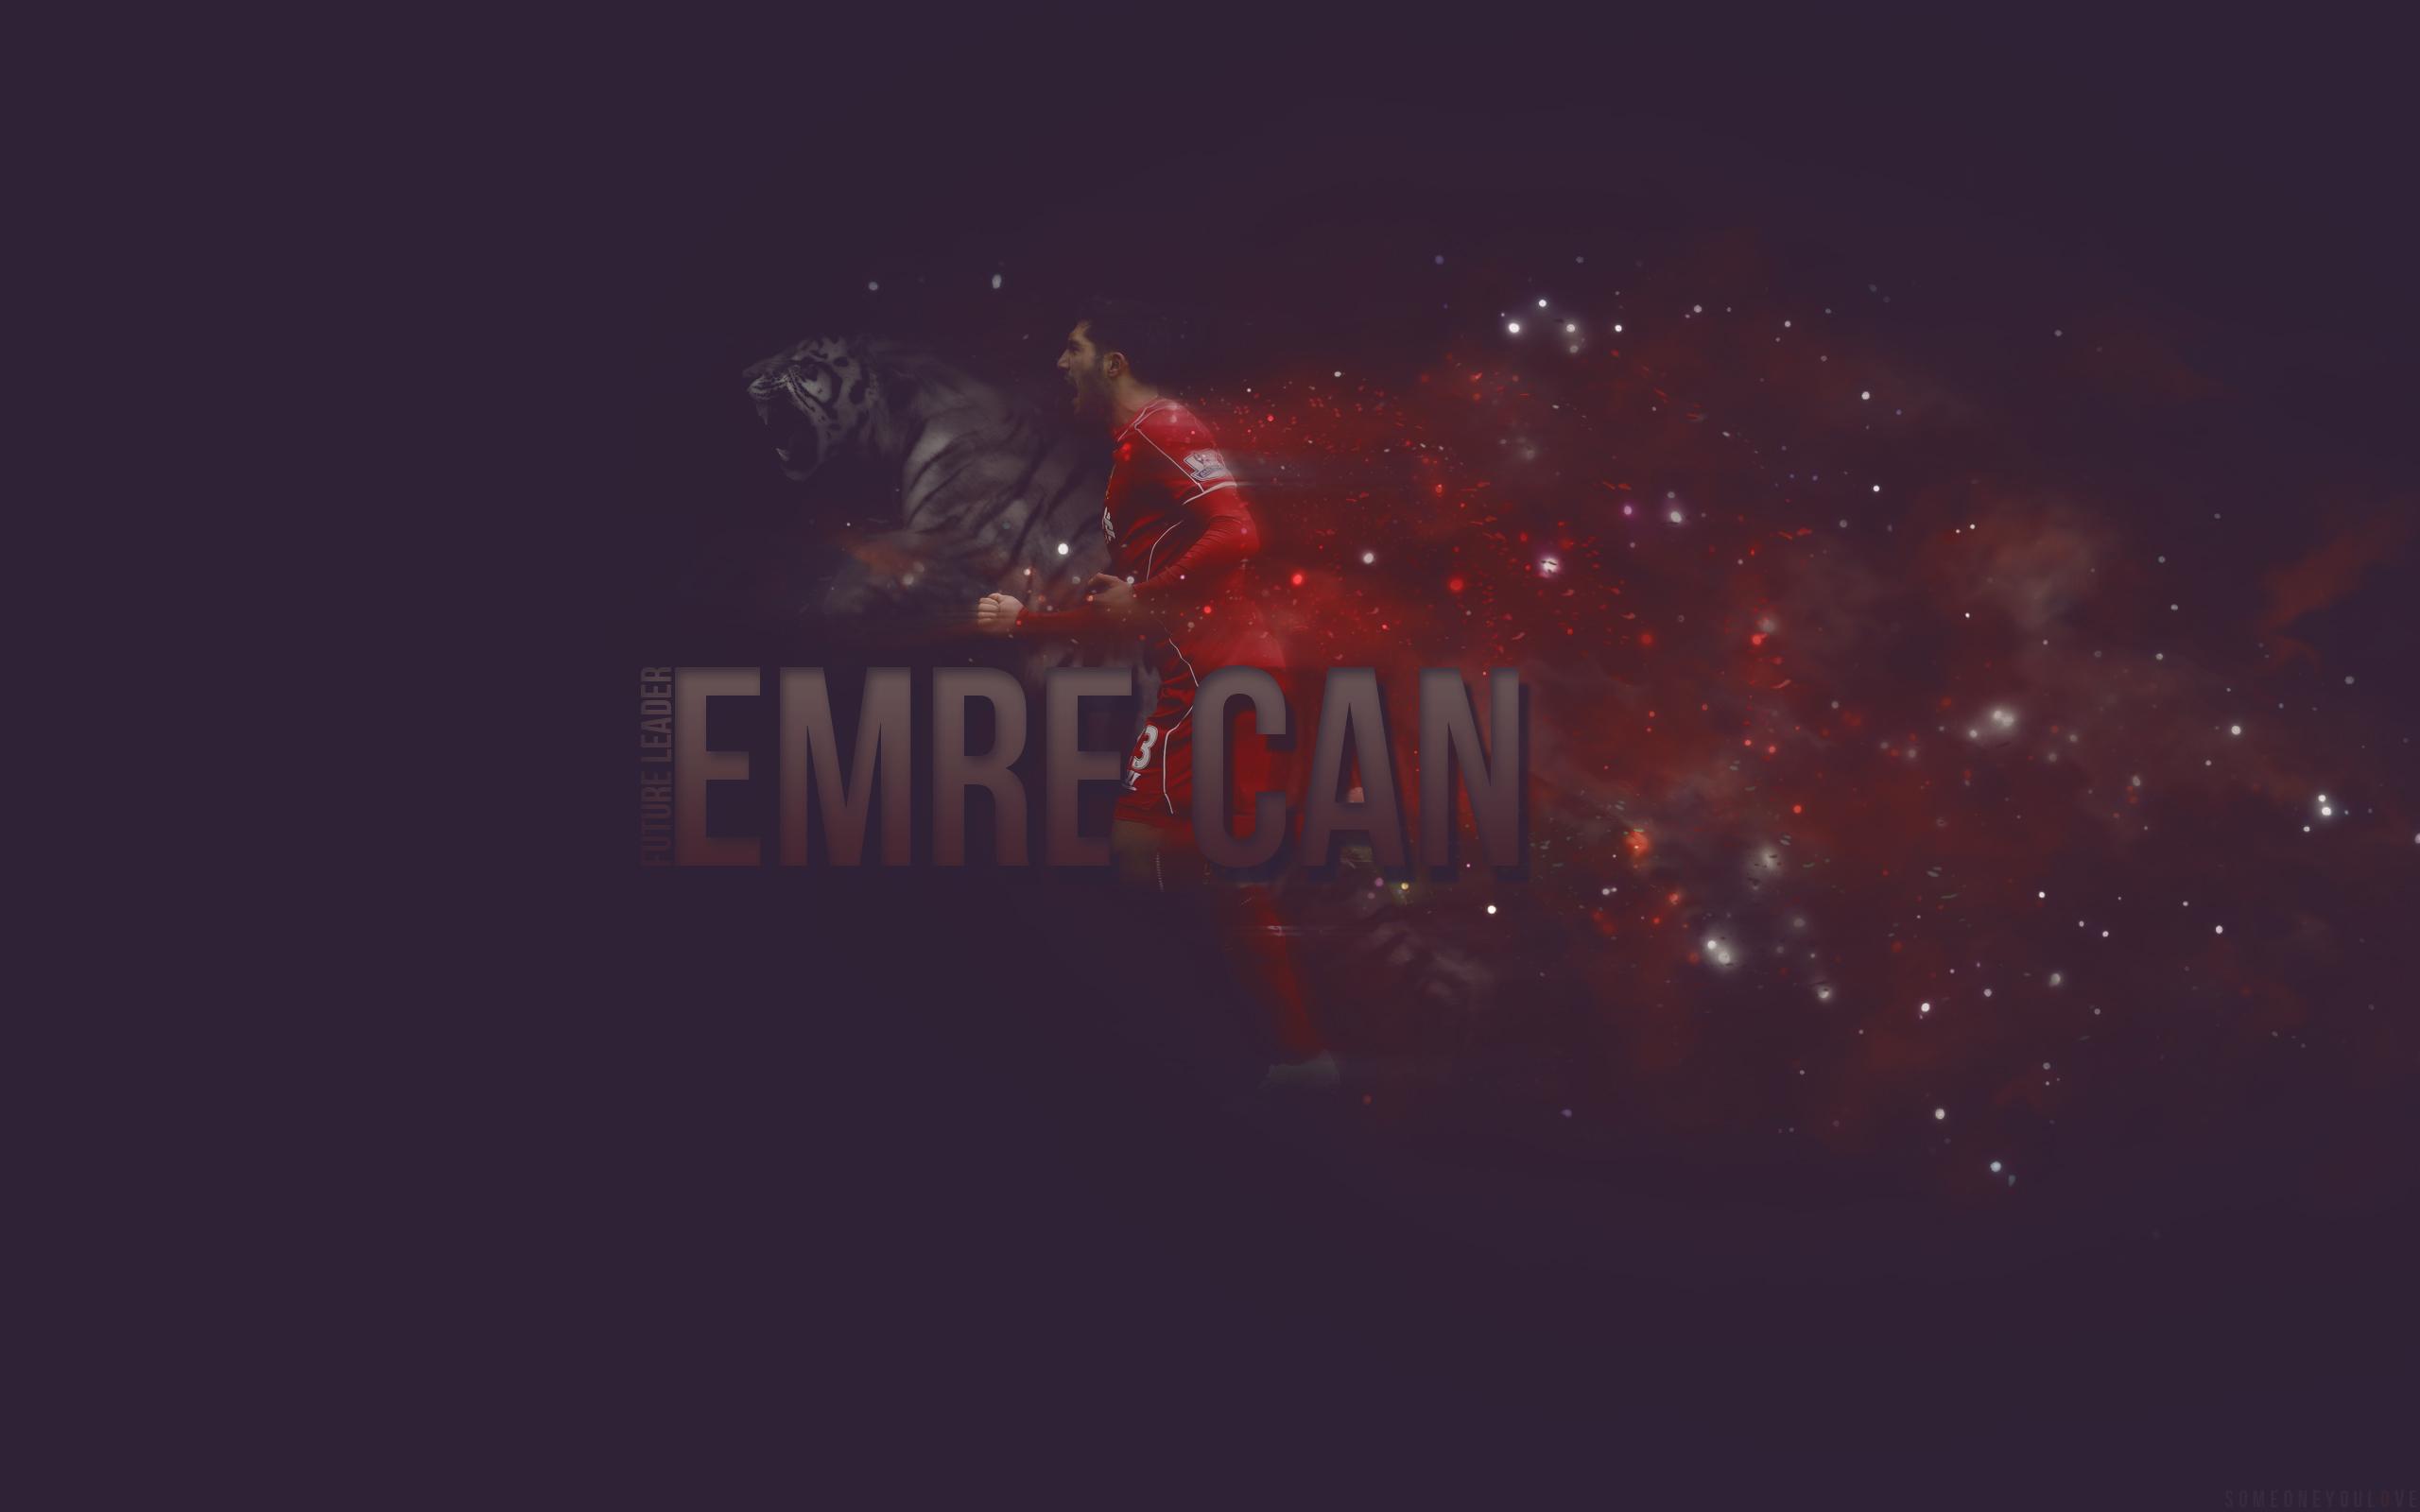 EMRE CAN By Someoneyoul0ve On DeviantArt